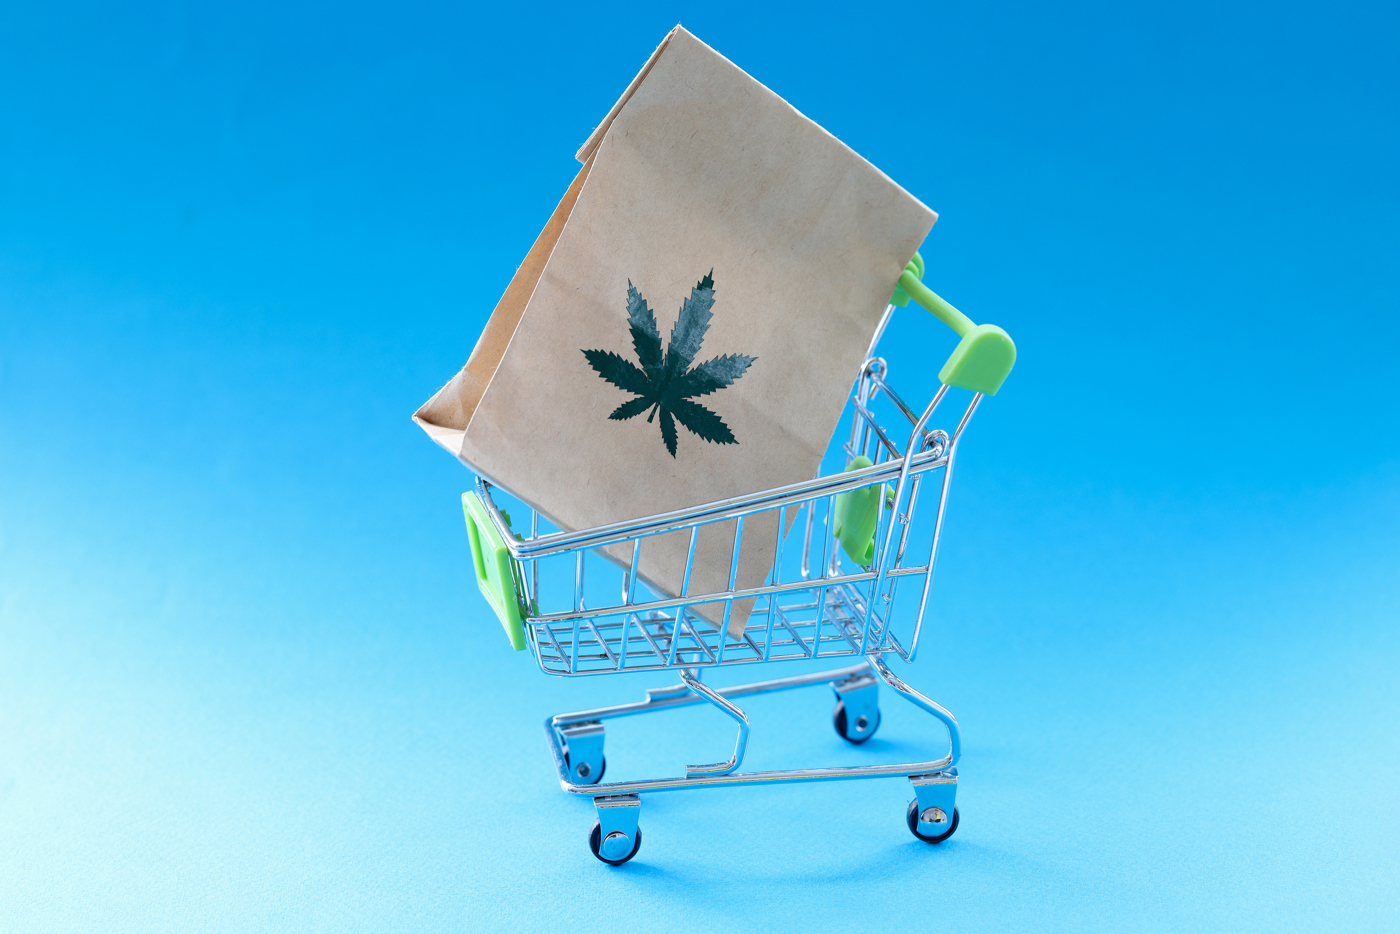 Cannabis stocks, marijuana stocks, pot stocks, CBD stocks